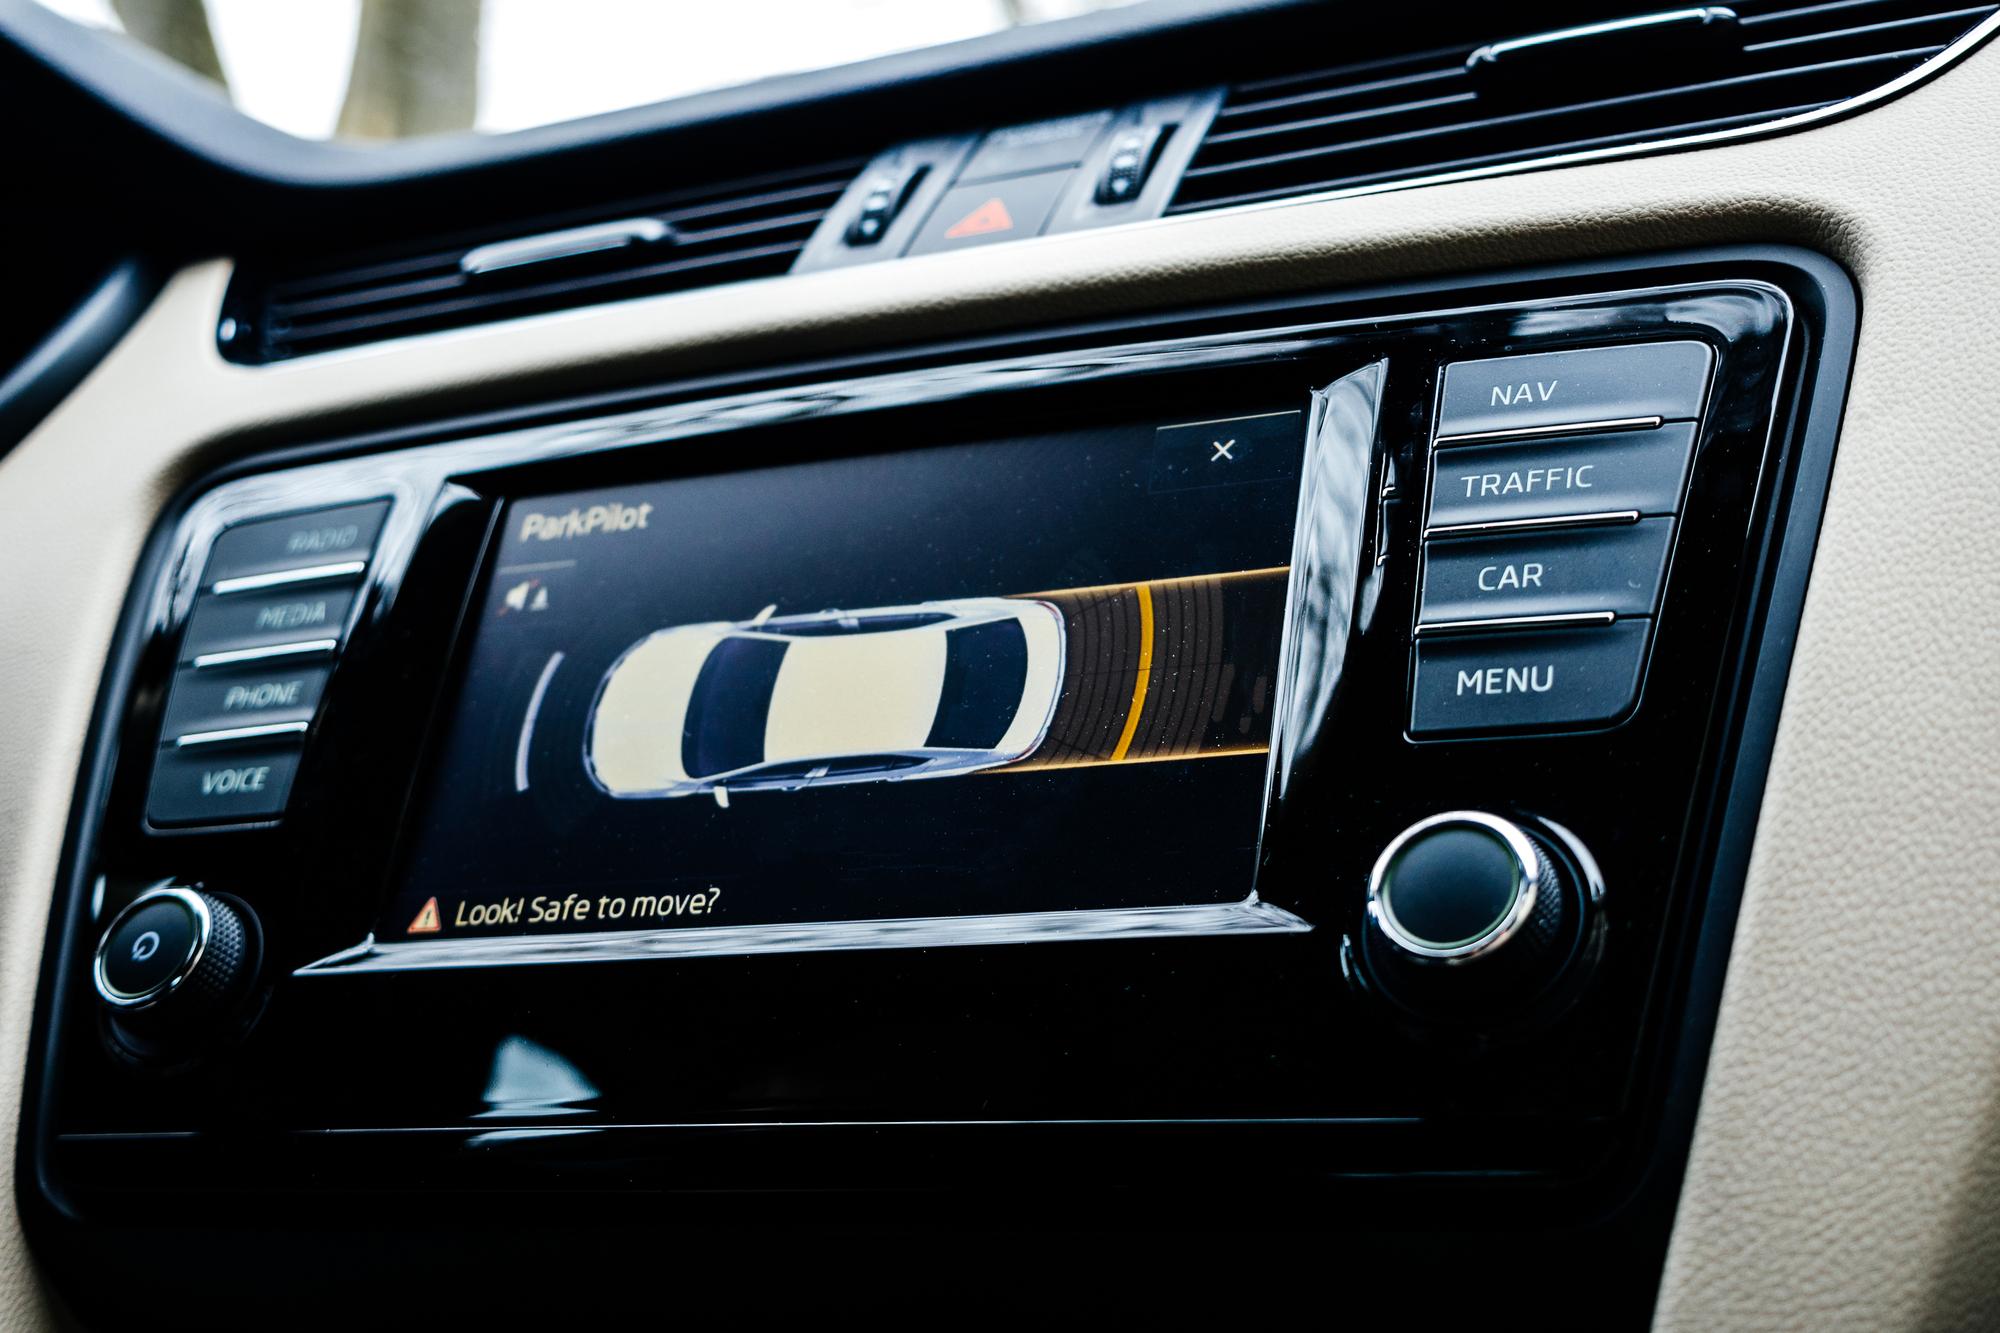 Как машина сама паркуется: Подробности